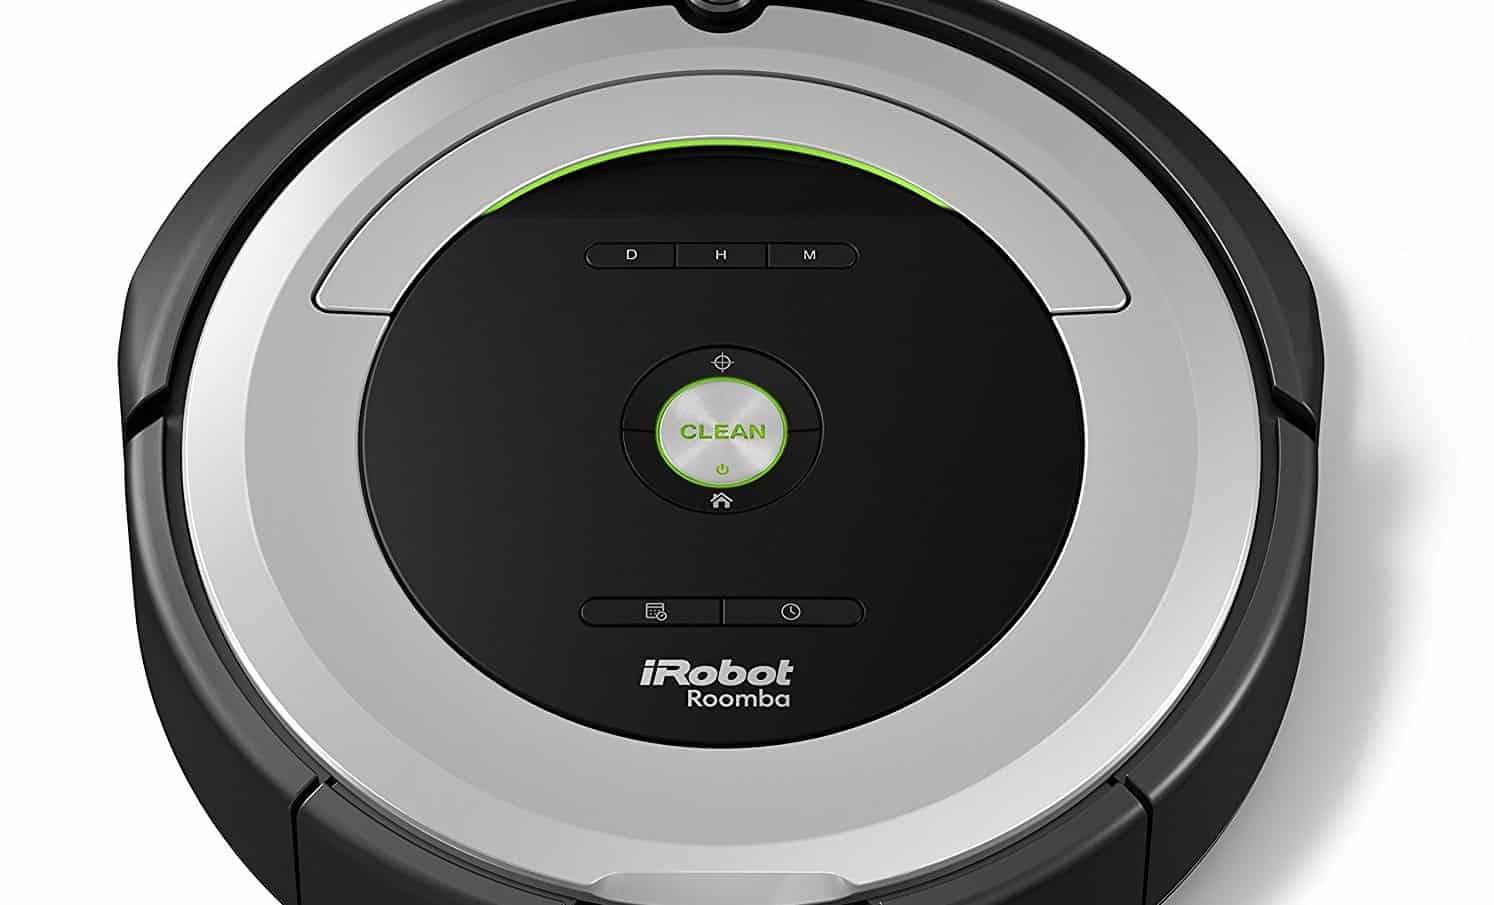 saugroboter roomba 680 von irobot um 18 reduziert. Black Bedroom Furniture Sets. Home Design Ideas